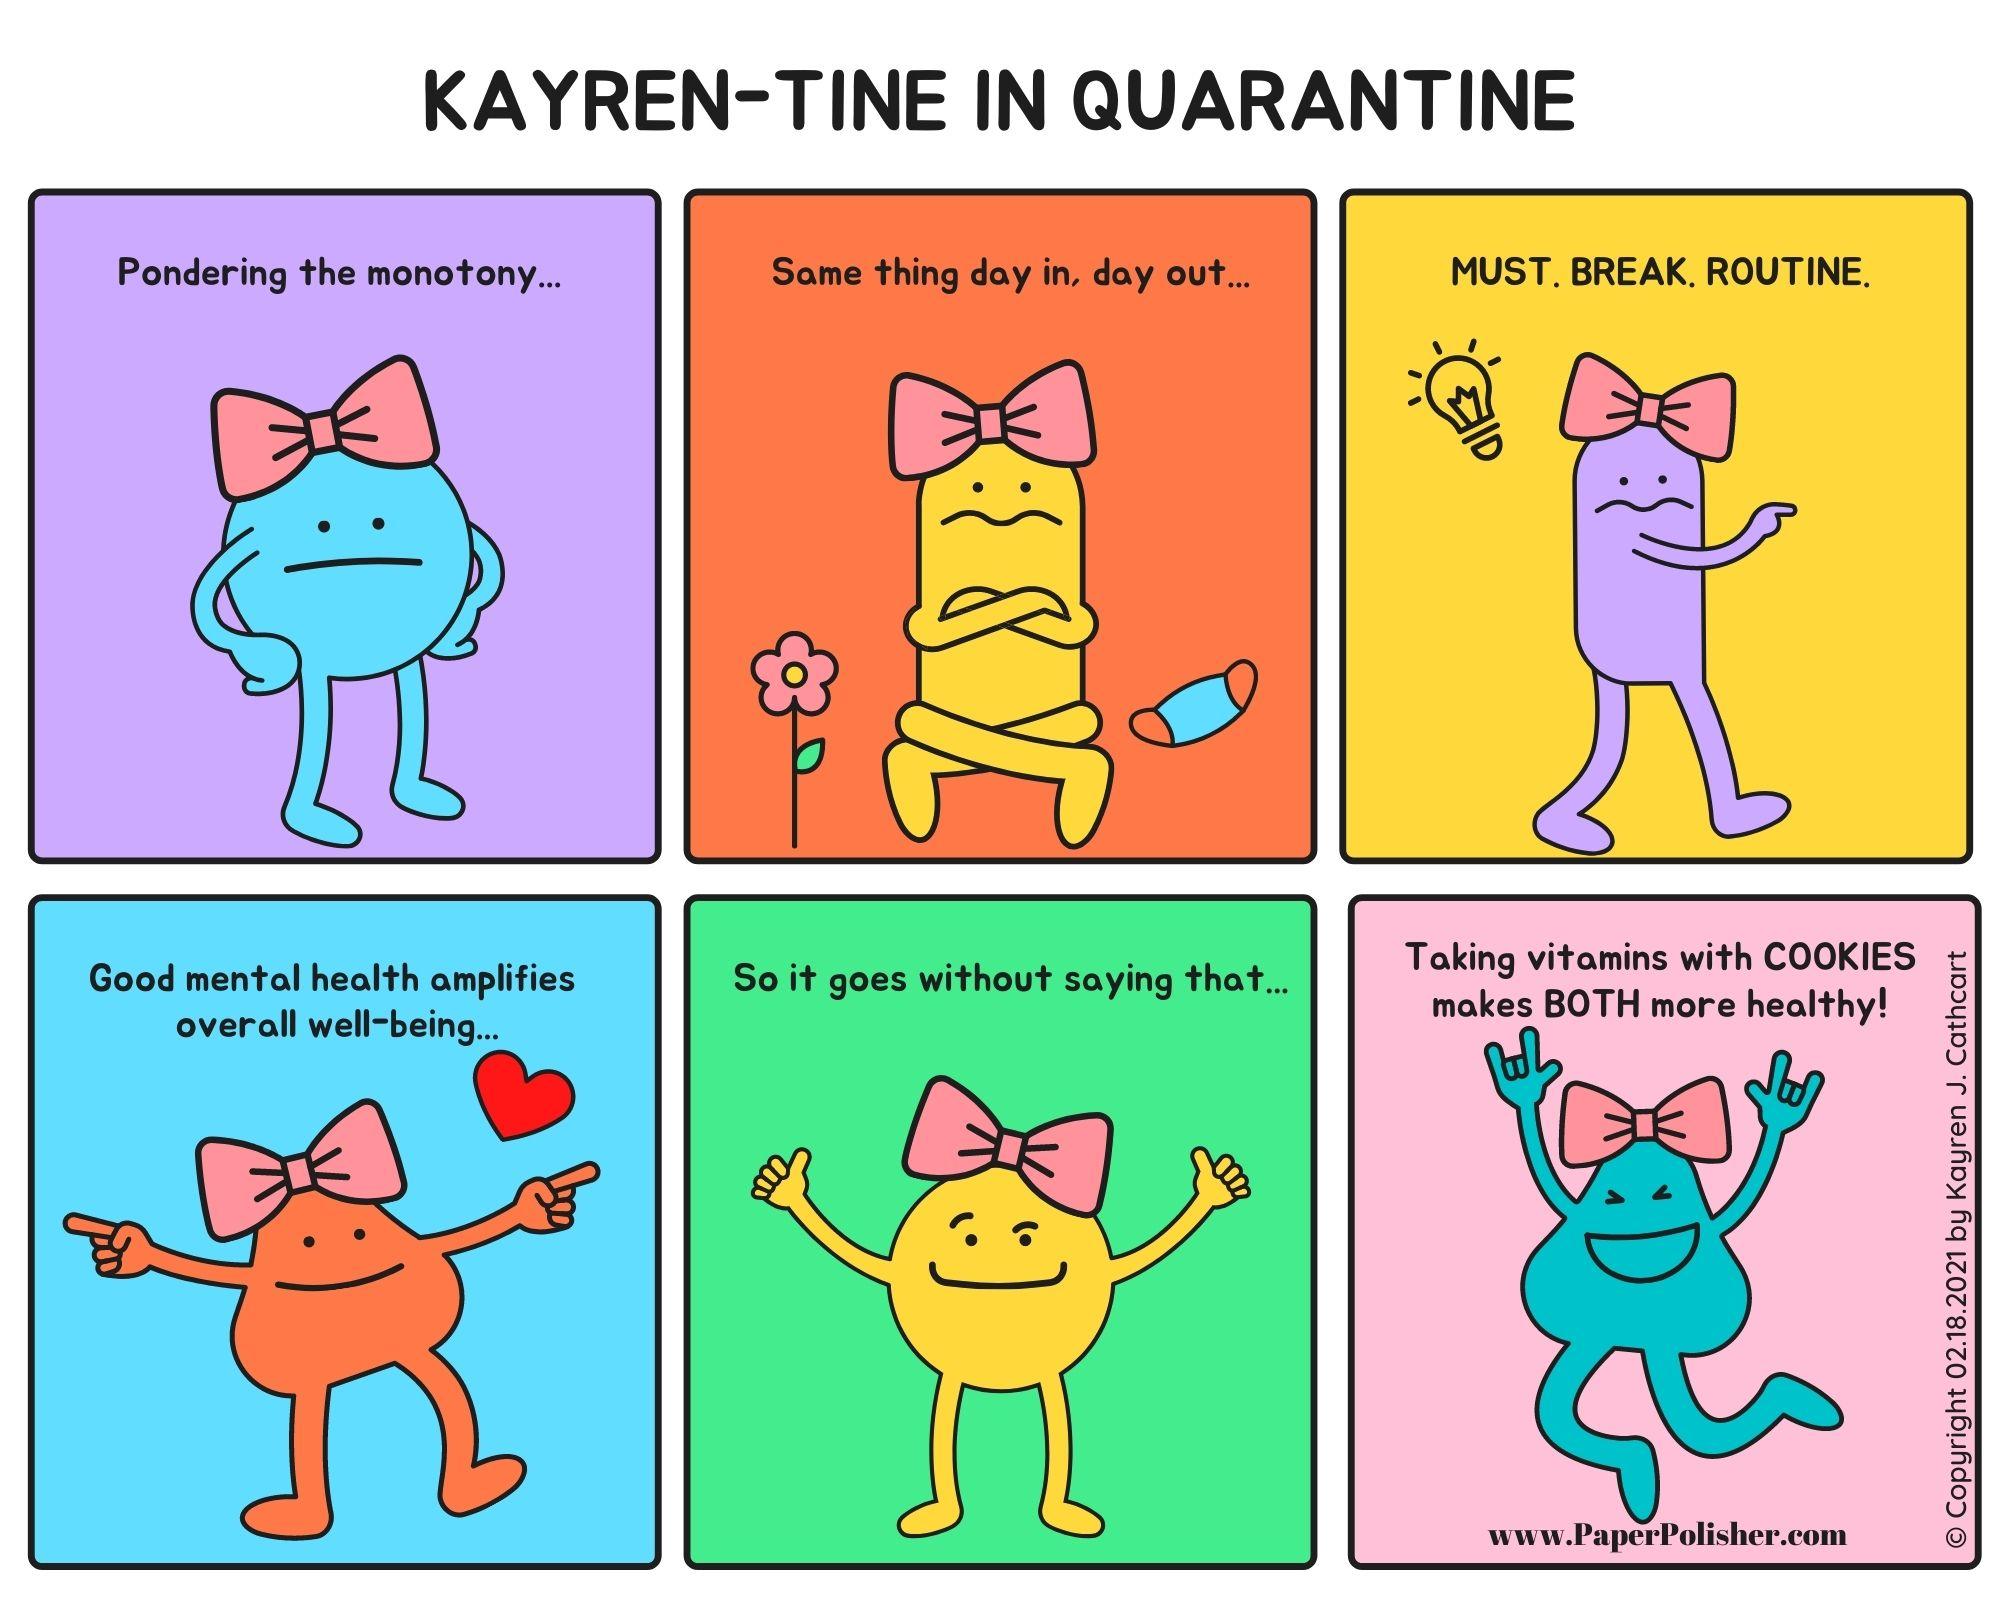 Kayren-Tine Comic Strip 02.18.2021